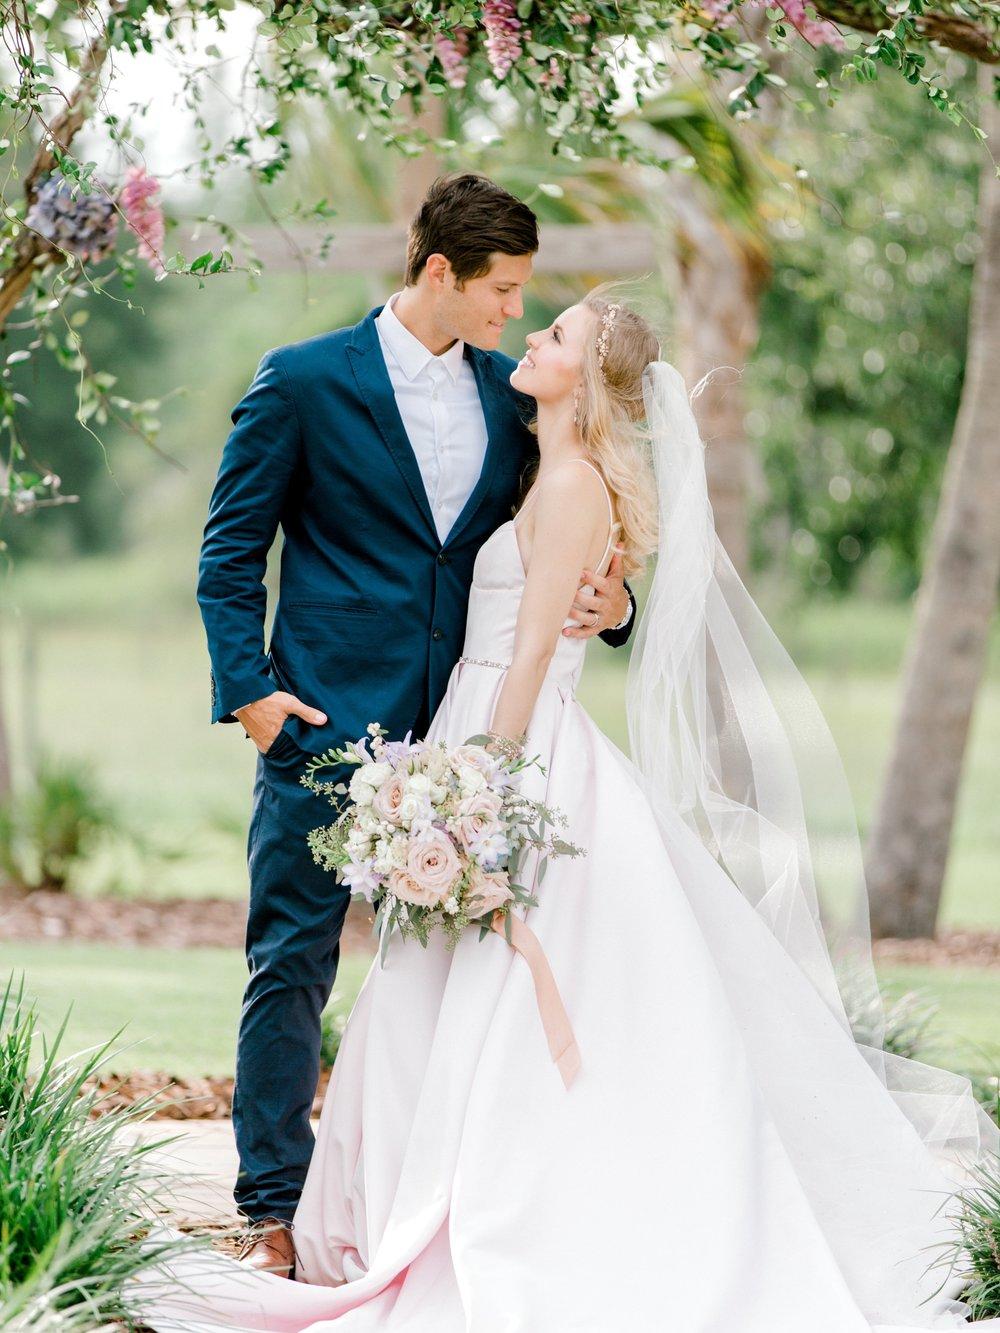 the-ringling-museum-wedding-elegant-moments-by-stella-1.jpg